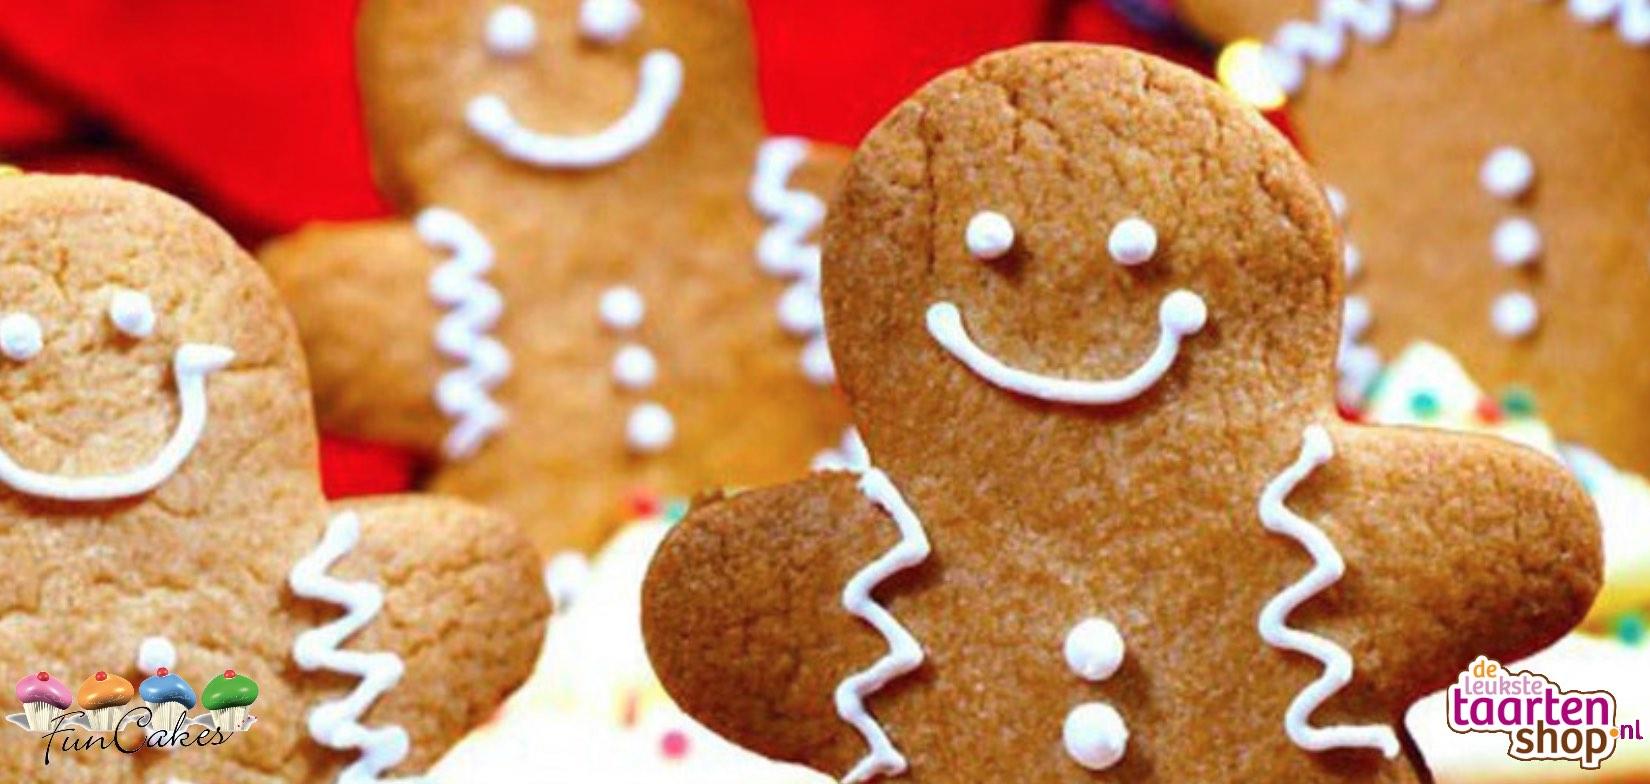 Gezellig samen kerstrecepten bakken